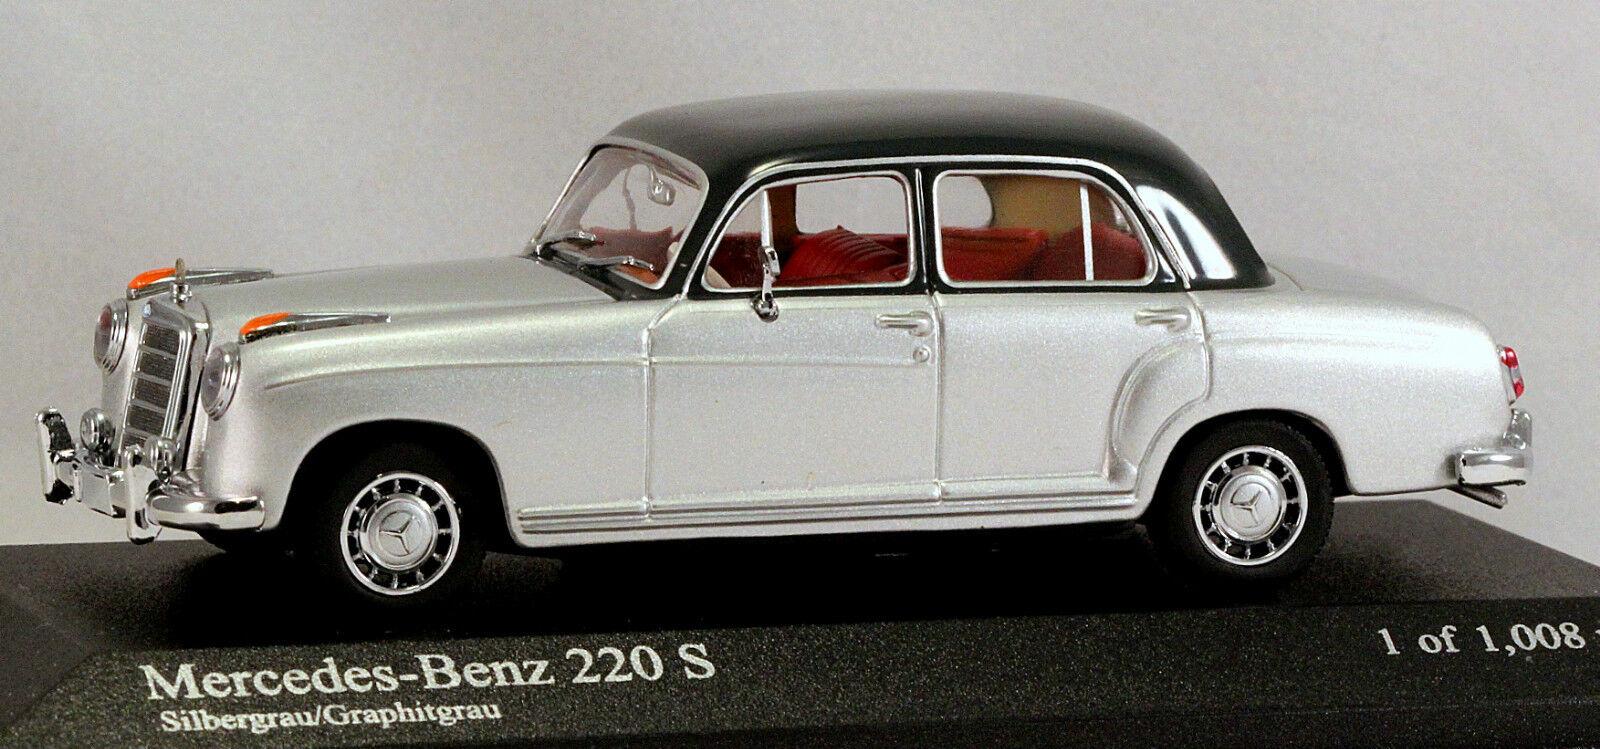 1 43 Minichamps 430033007 Mercedes Benz 220S W180 1956 argento Menta en caja